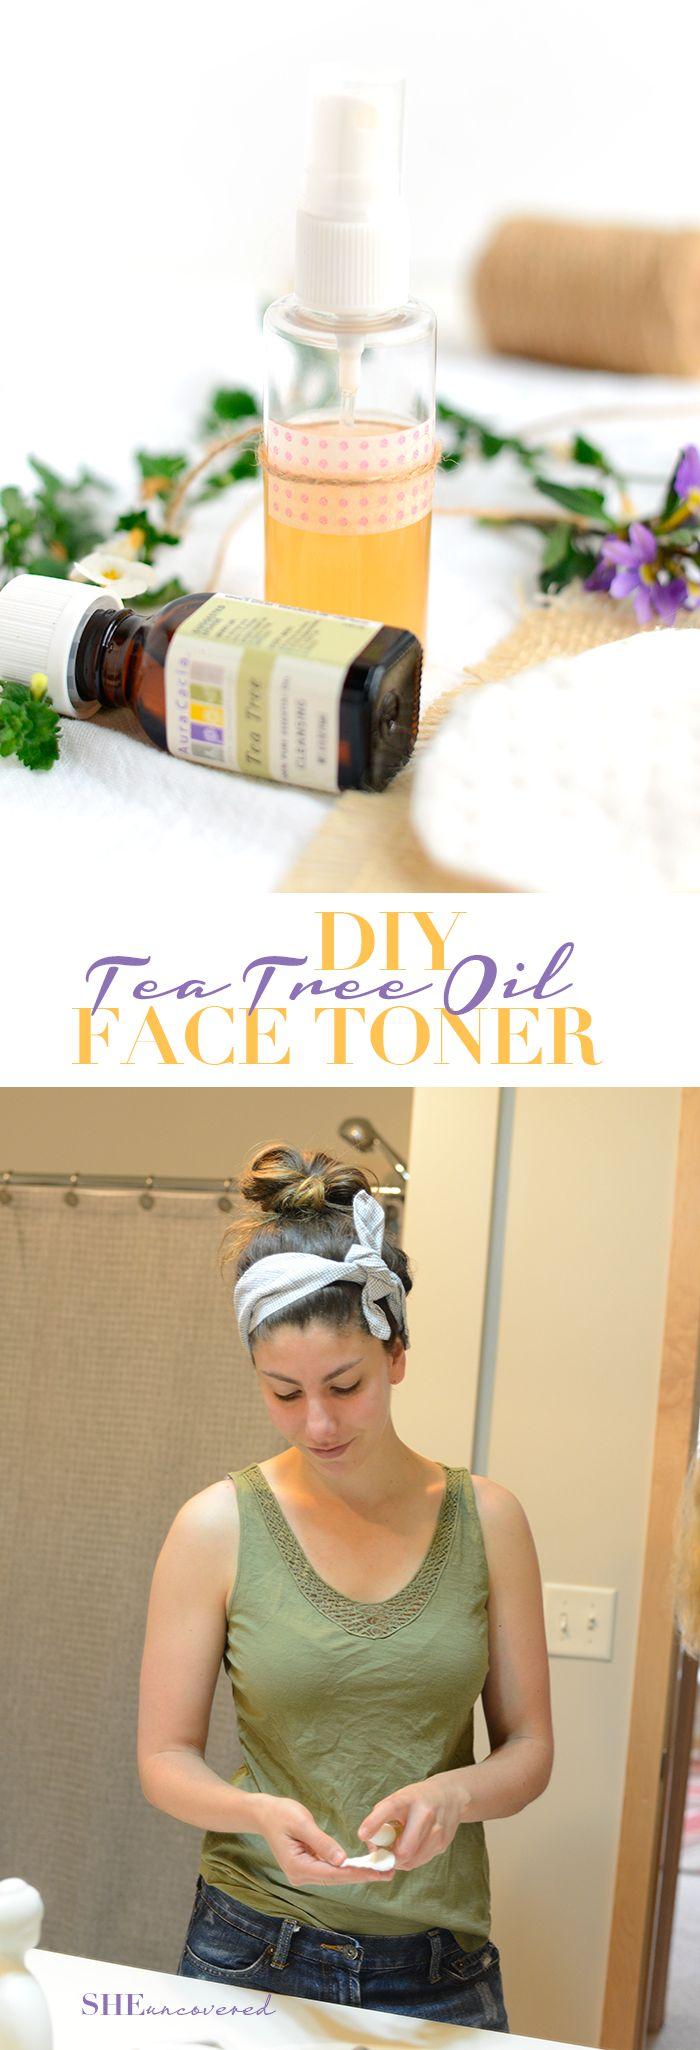 tea tree oil facial mask